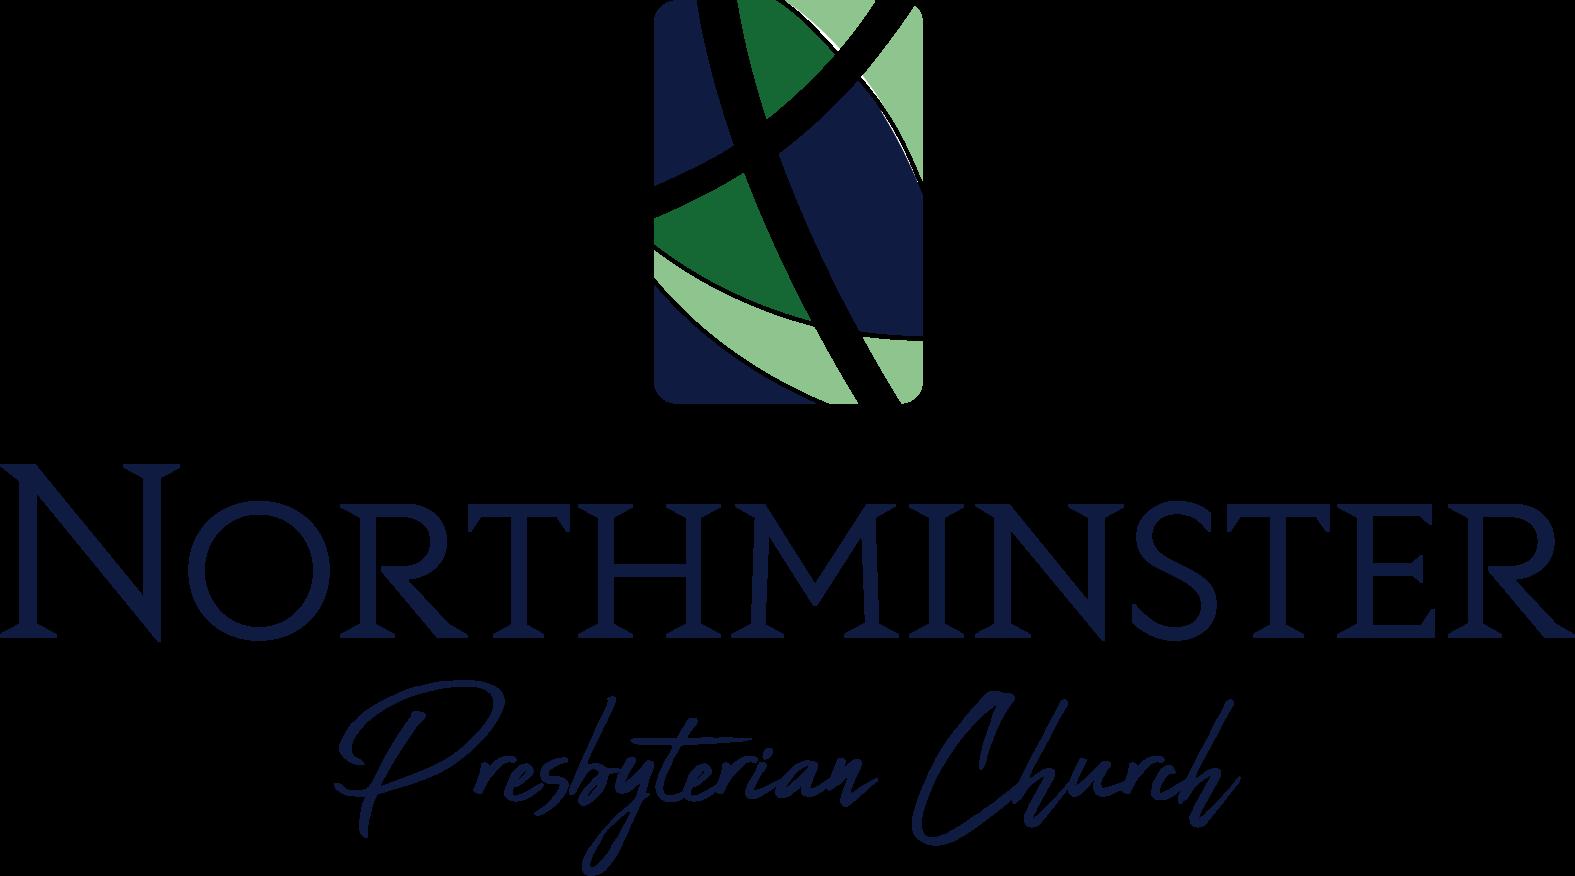 Northminster